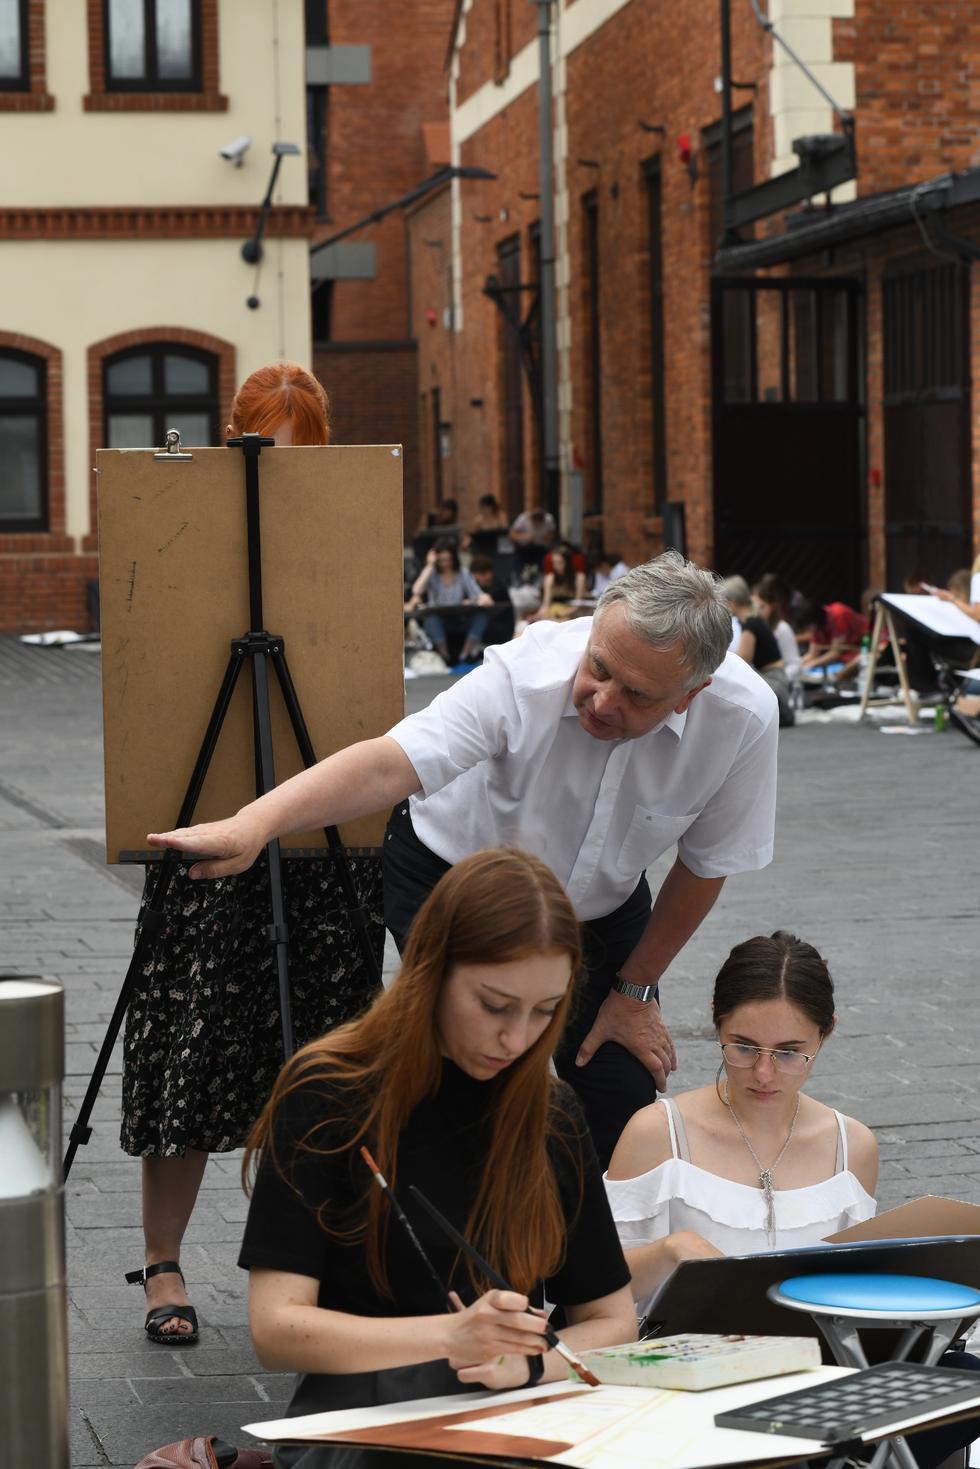 Plener malarski na Wydziale Architektury Politechniki Krakowskiej